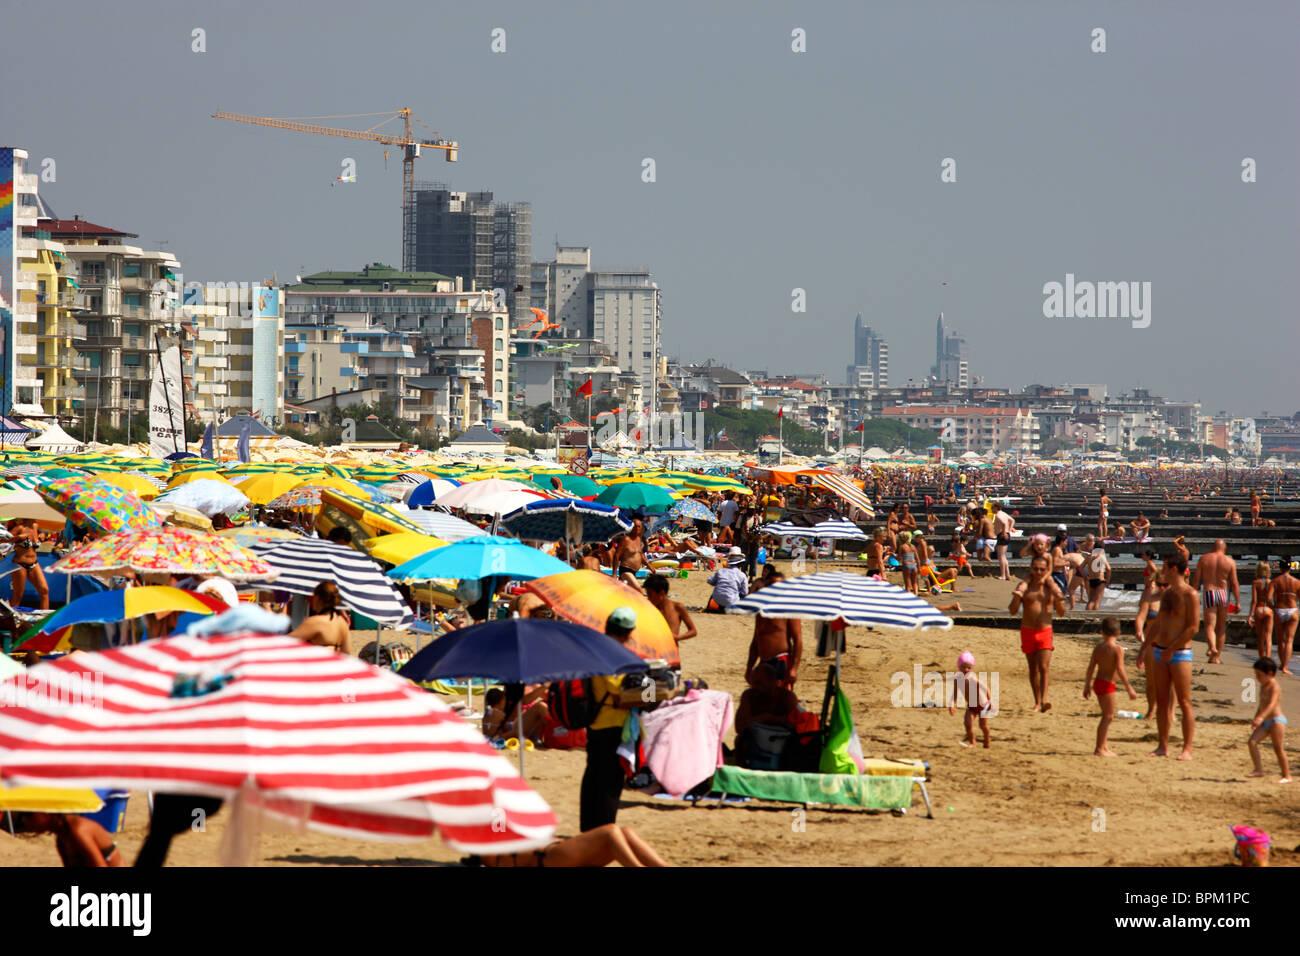 Beach of Jesolo, Adriatic Sea, Italy. - Stock Image